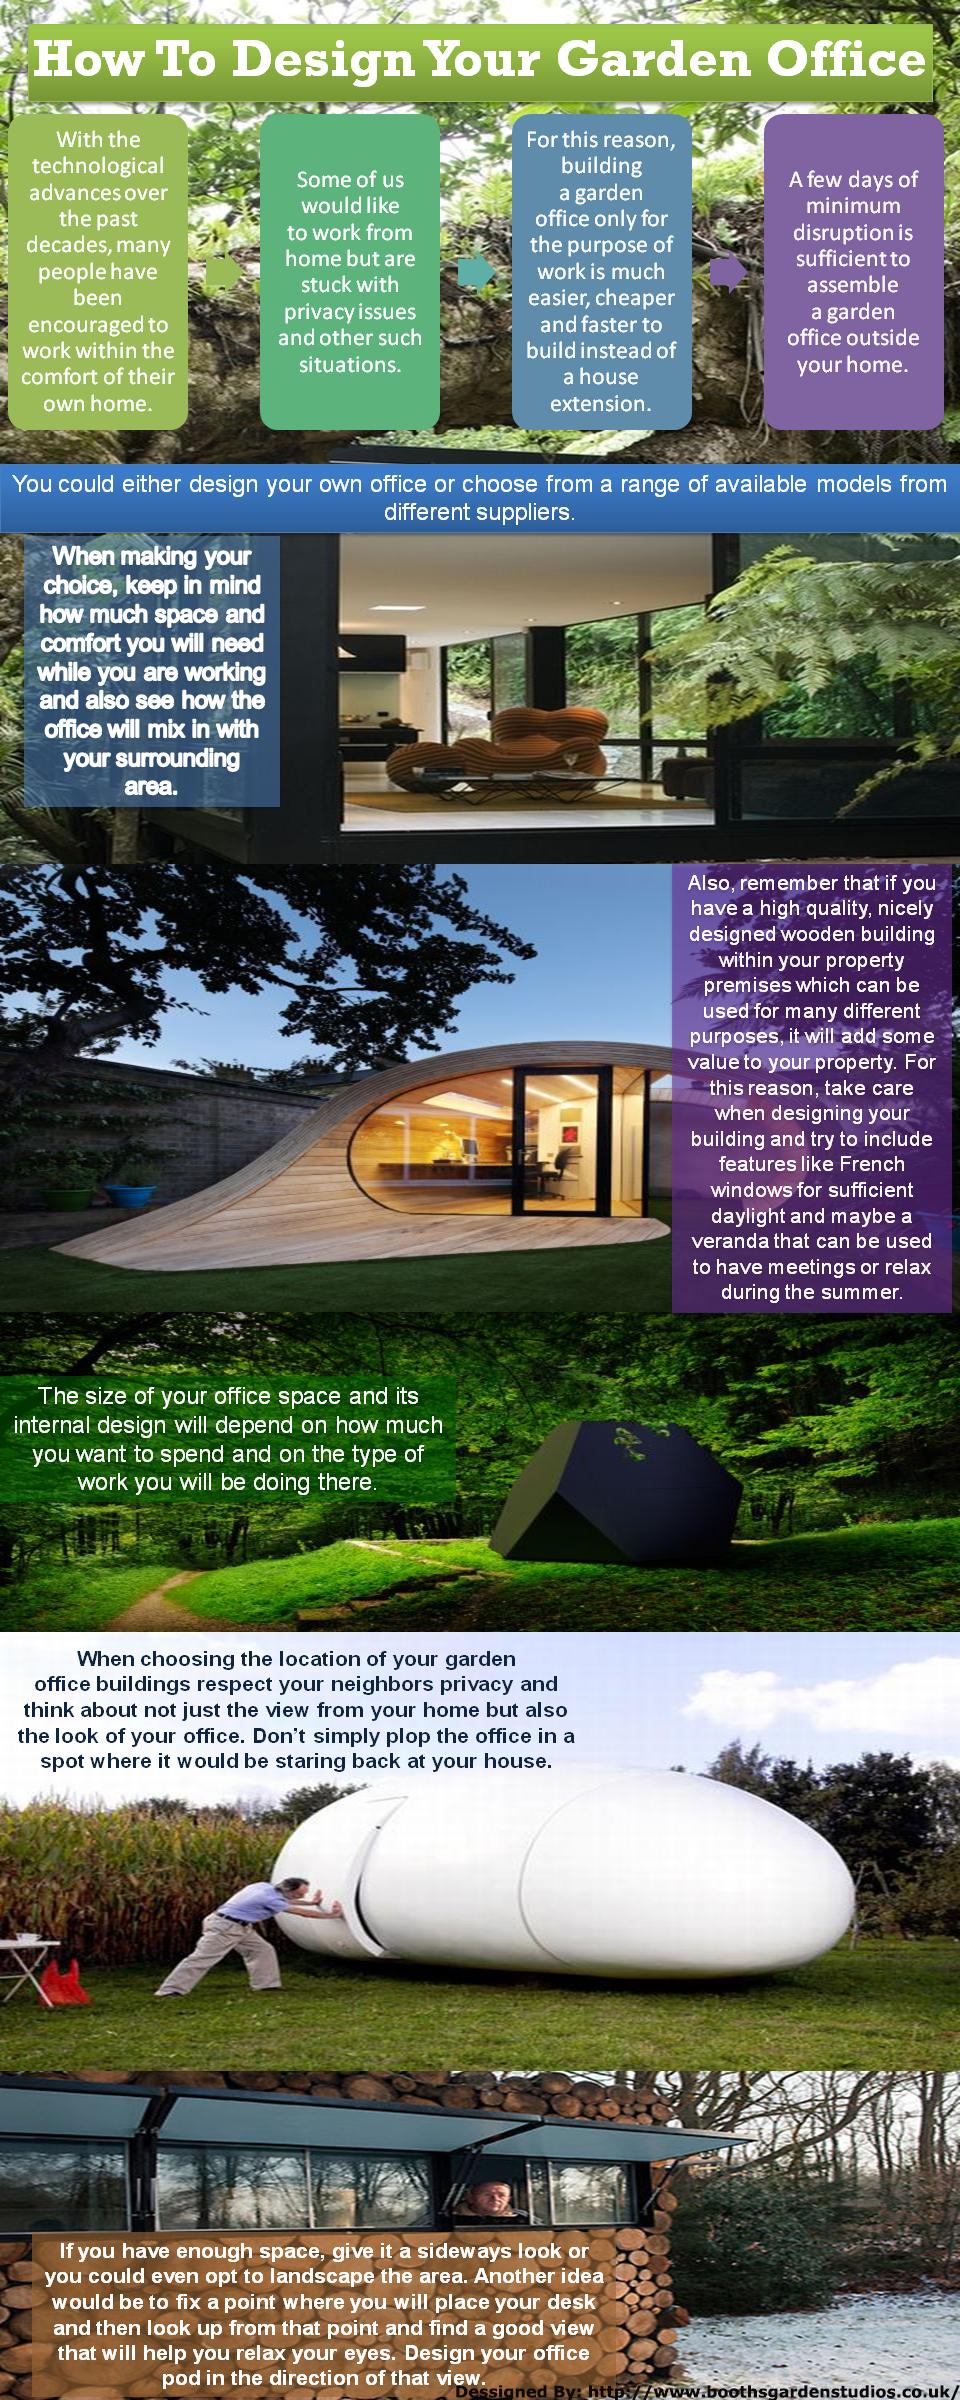 How To Design Your Garden Office_525b957f0e199